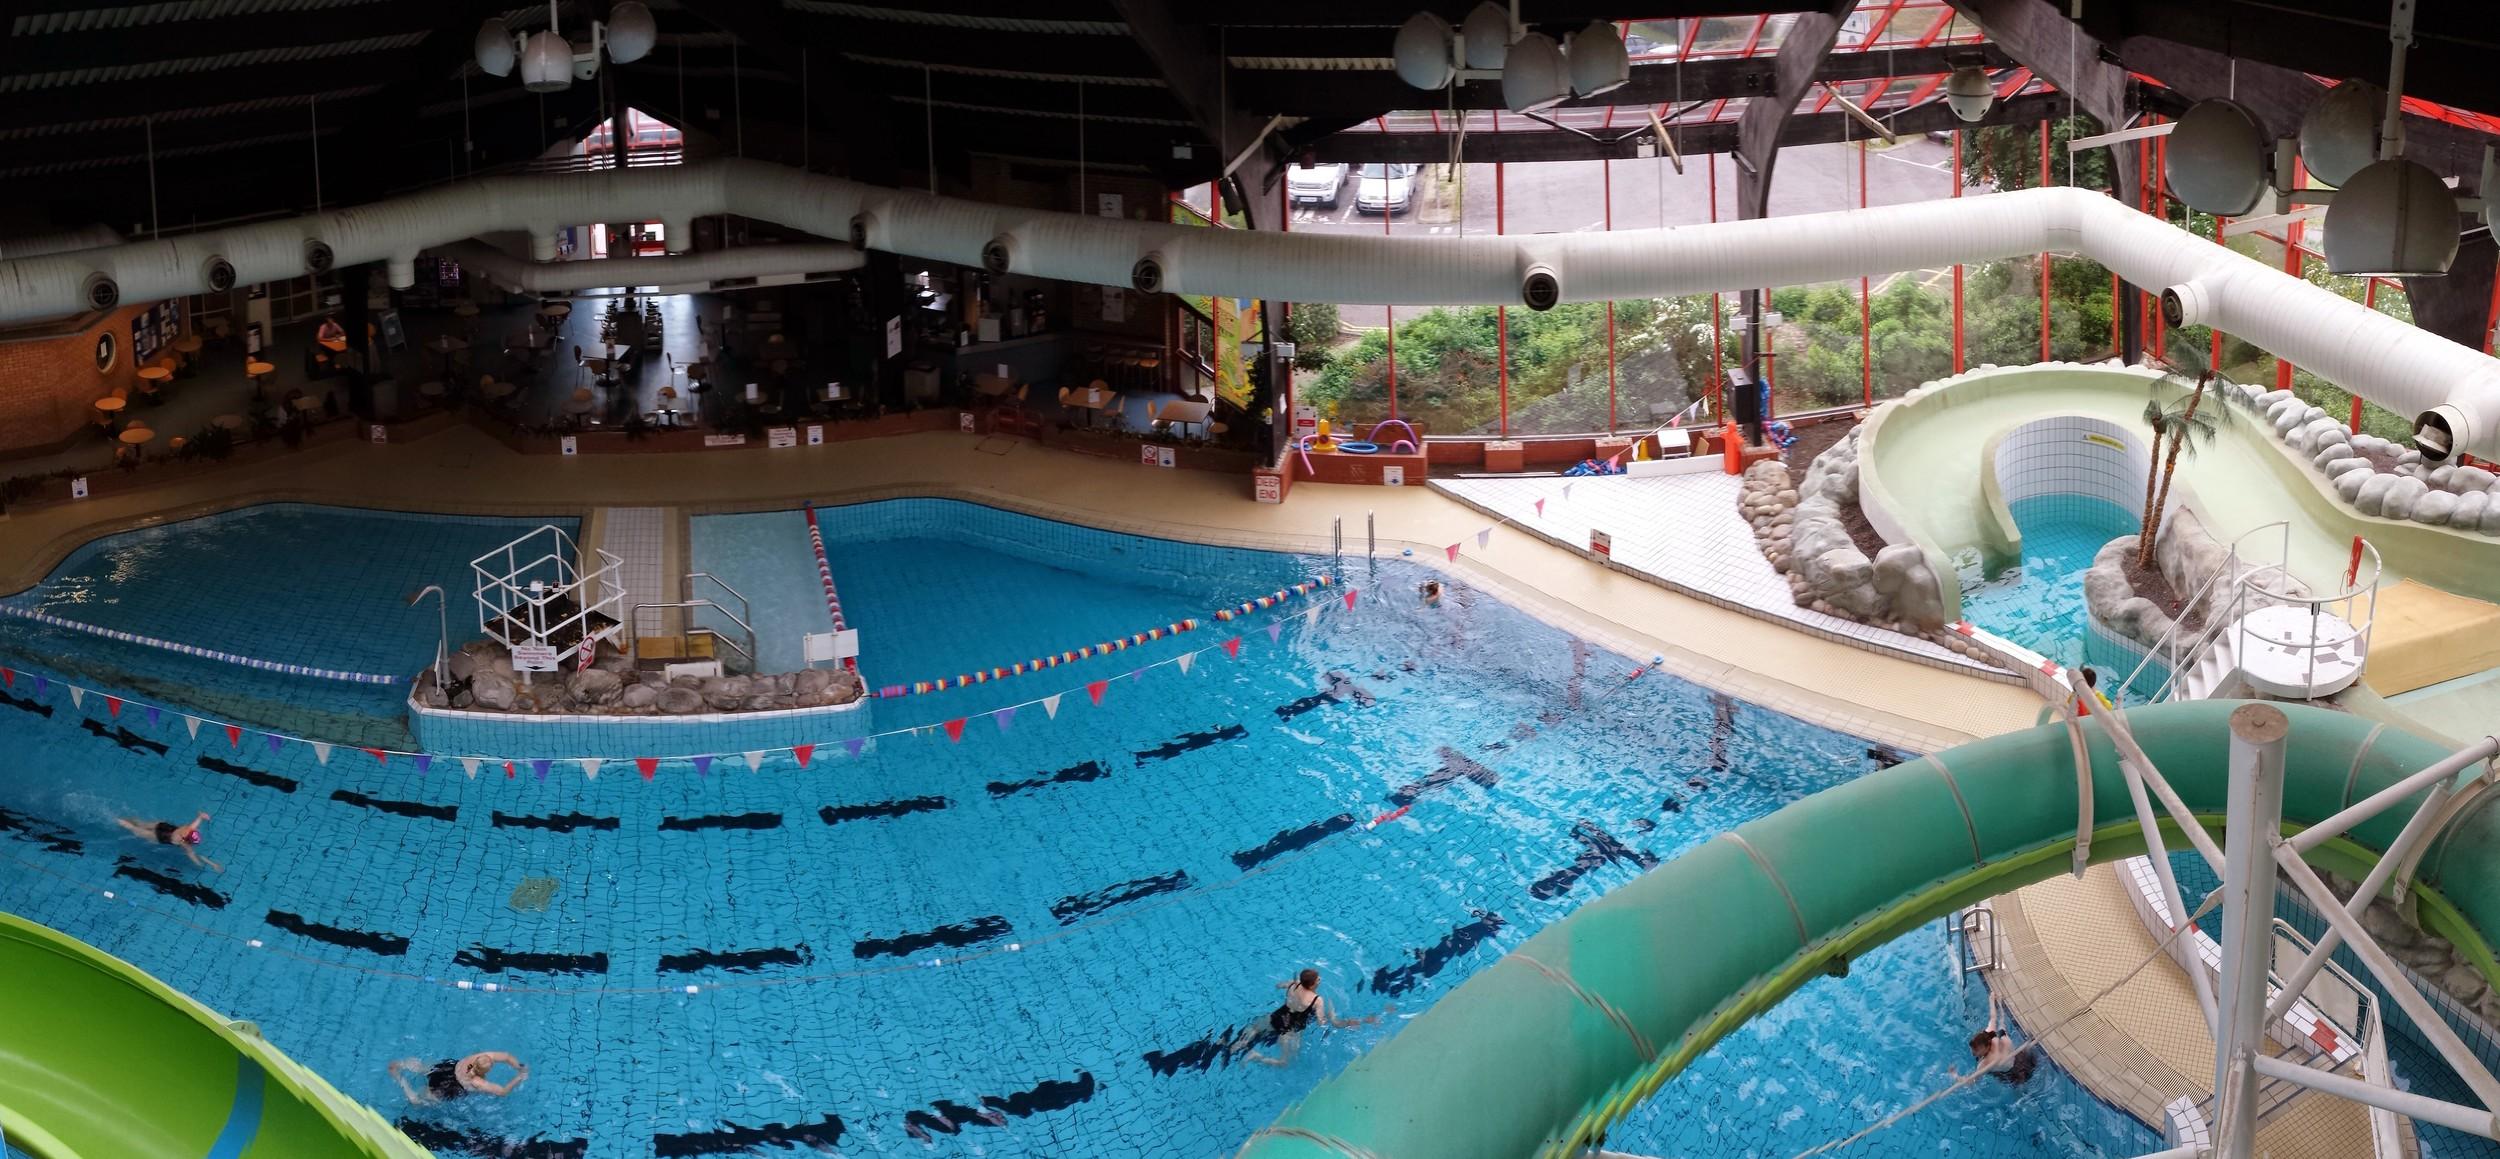 Pre-refurbishment and Poolview installation photograph